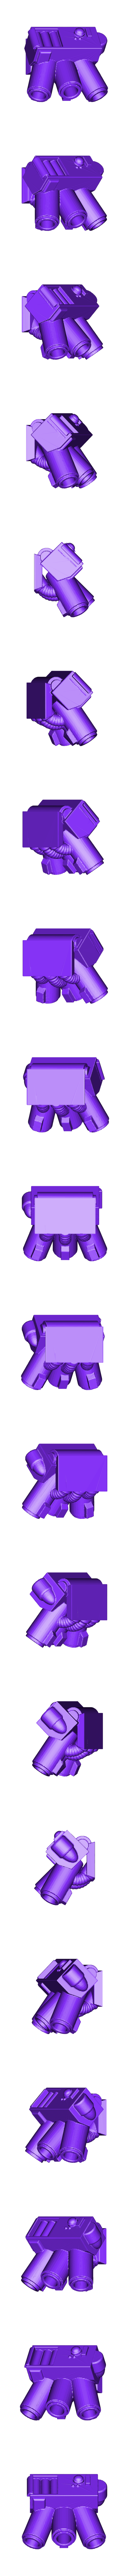 smoke_grenade.stl Download free STL file Super Breaking and Entering Boxy Robot • 3D printer model, bentanweihao